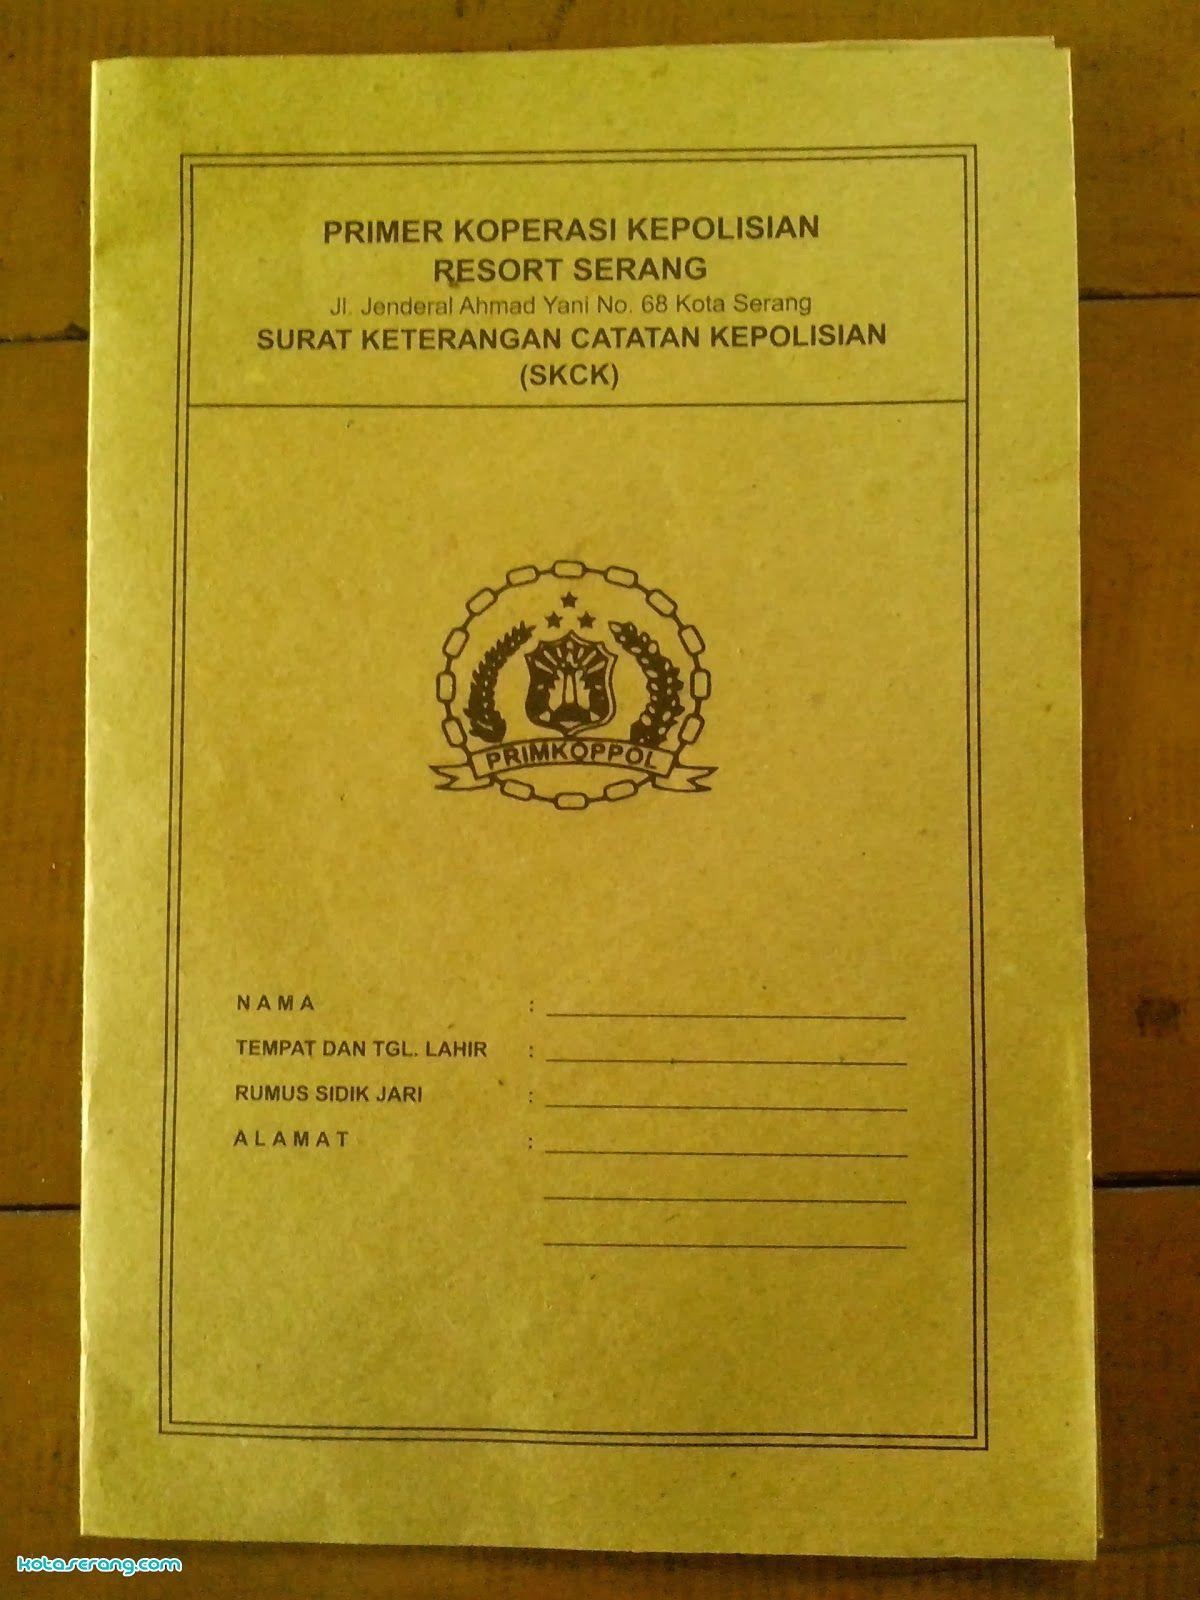 Proses Dan Langkah Pembuatan Surat Keterangan Catatan